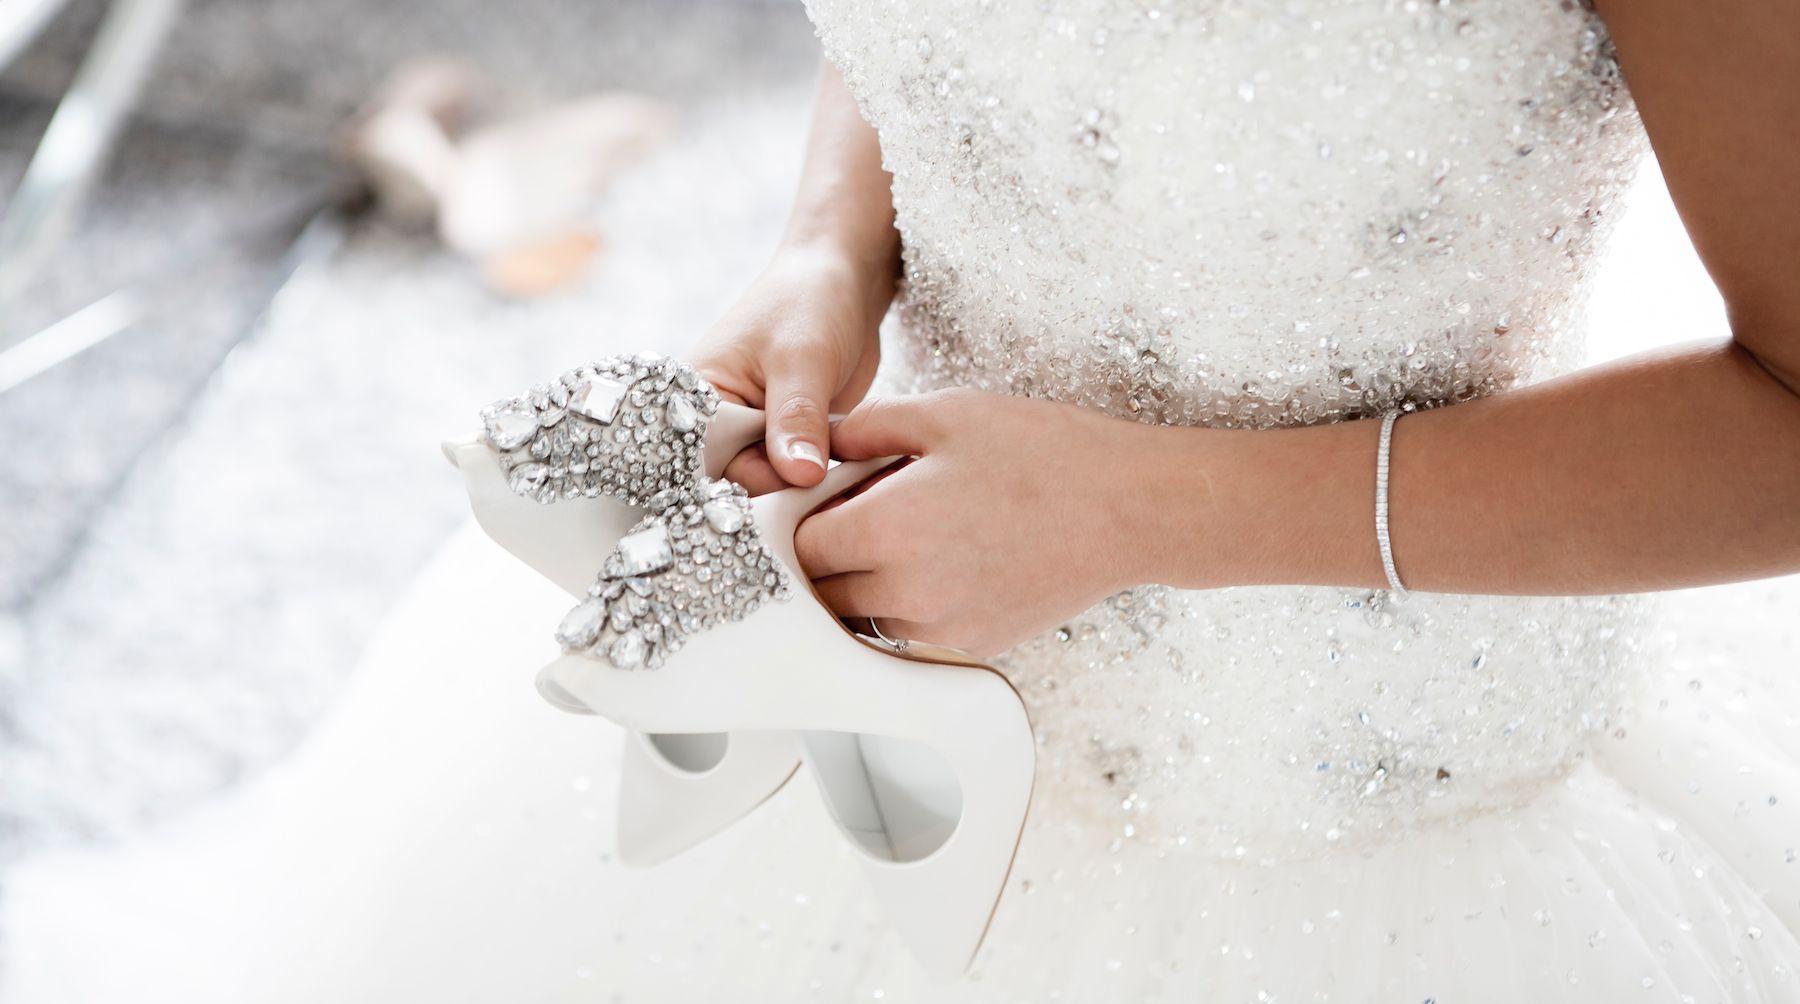 wedding_day_regrets-1532108478870-1532108481029.jpg